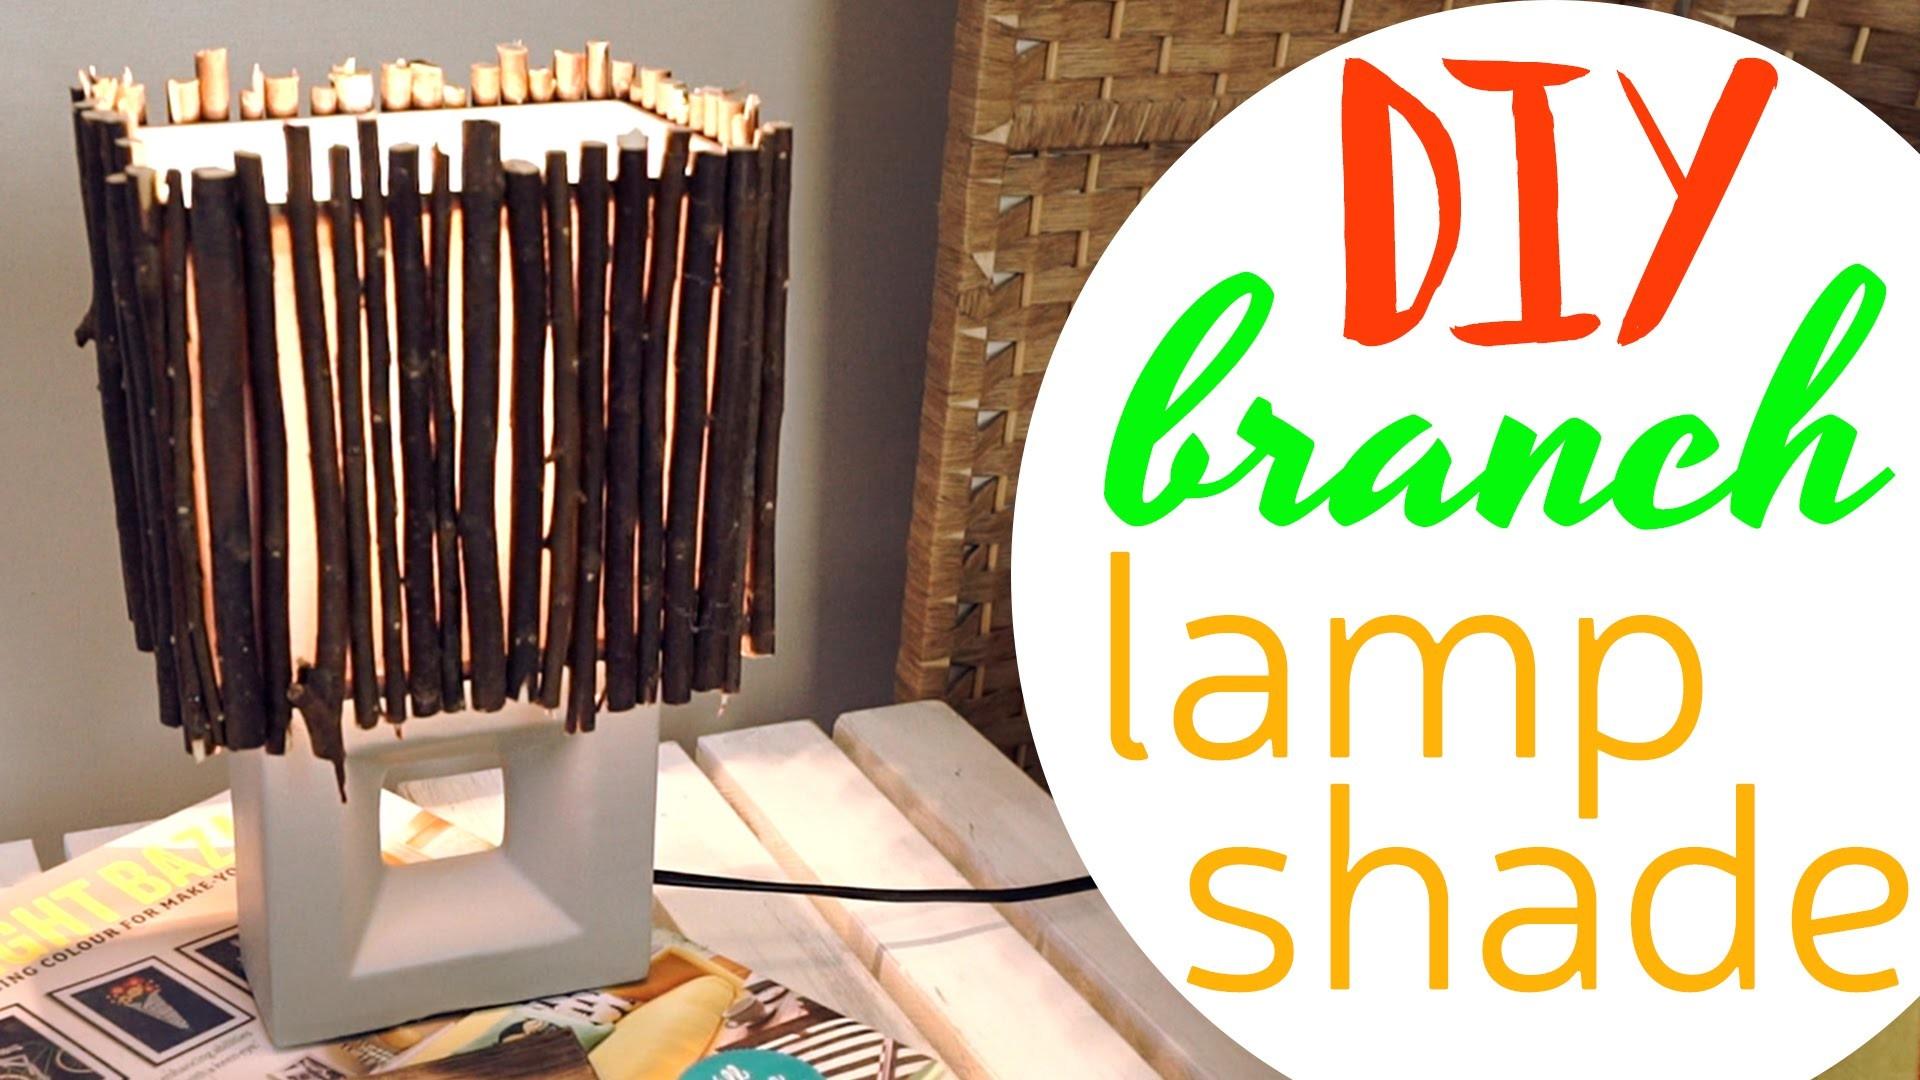 DIY: Branch Lamp Shade - Creativewithlove.com